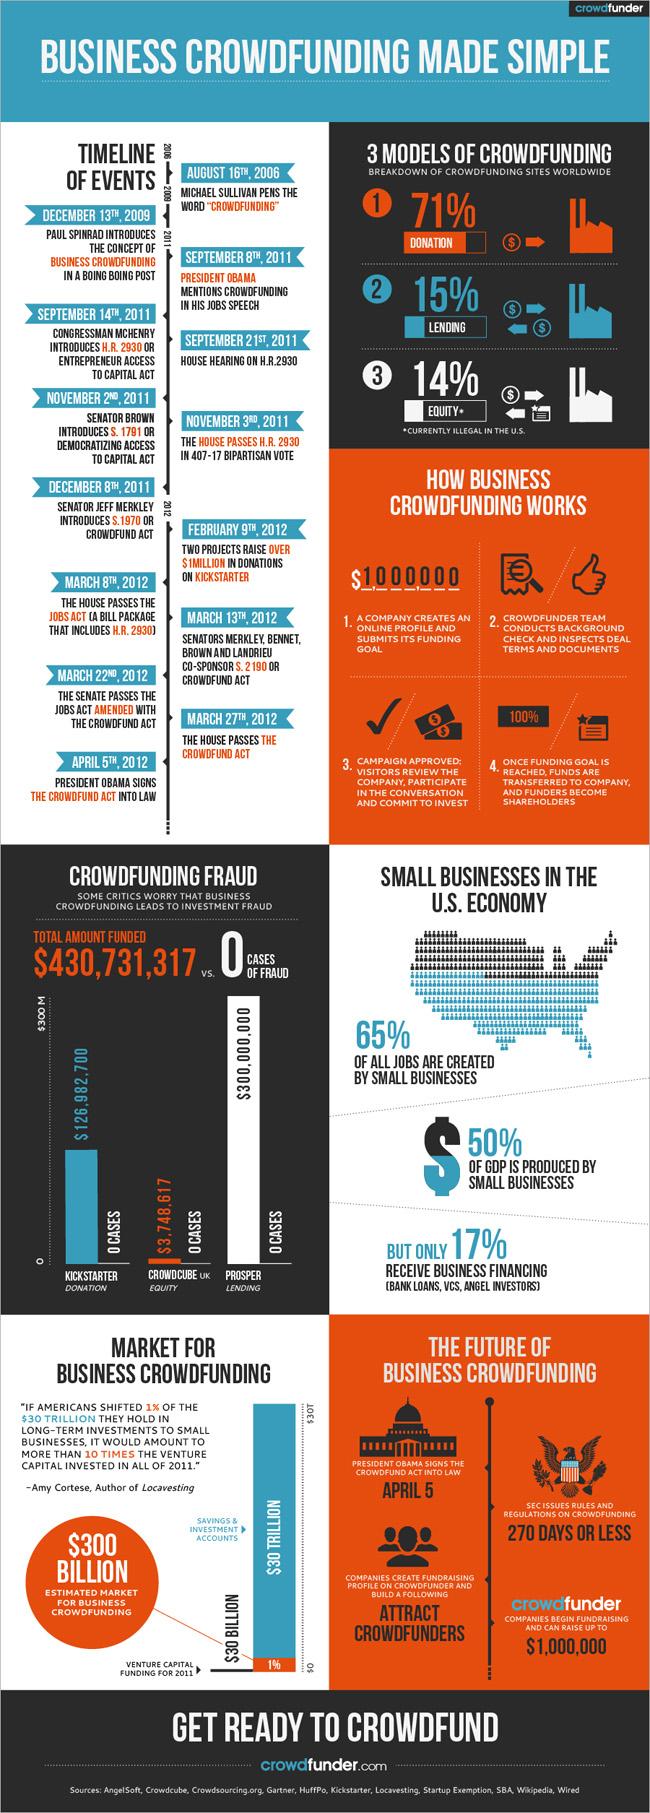 Equity Crowdfunding - crowdfunder.com